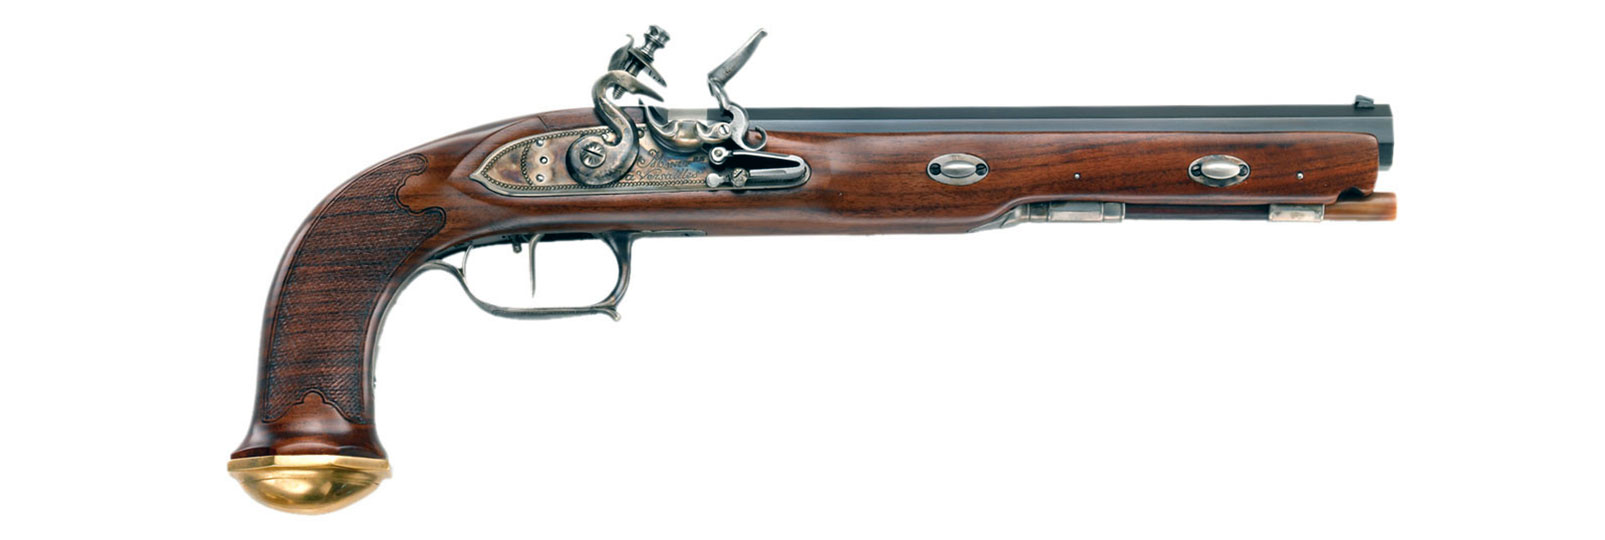 Boutet 1er Empire Pistol flintlock model